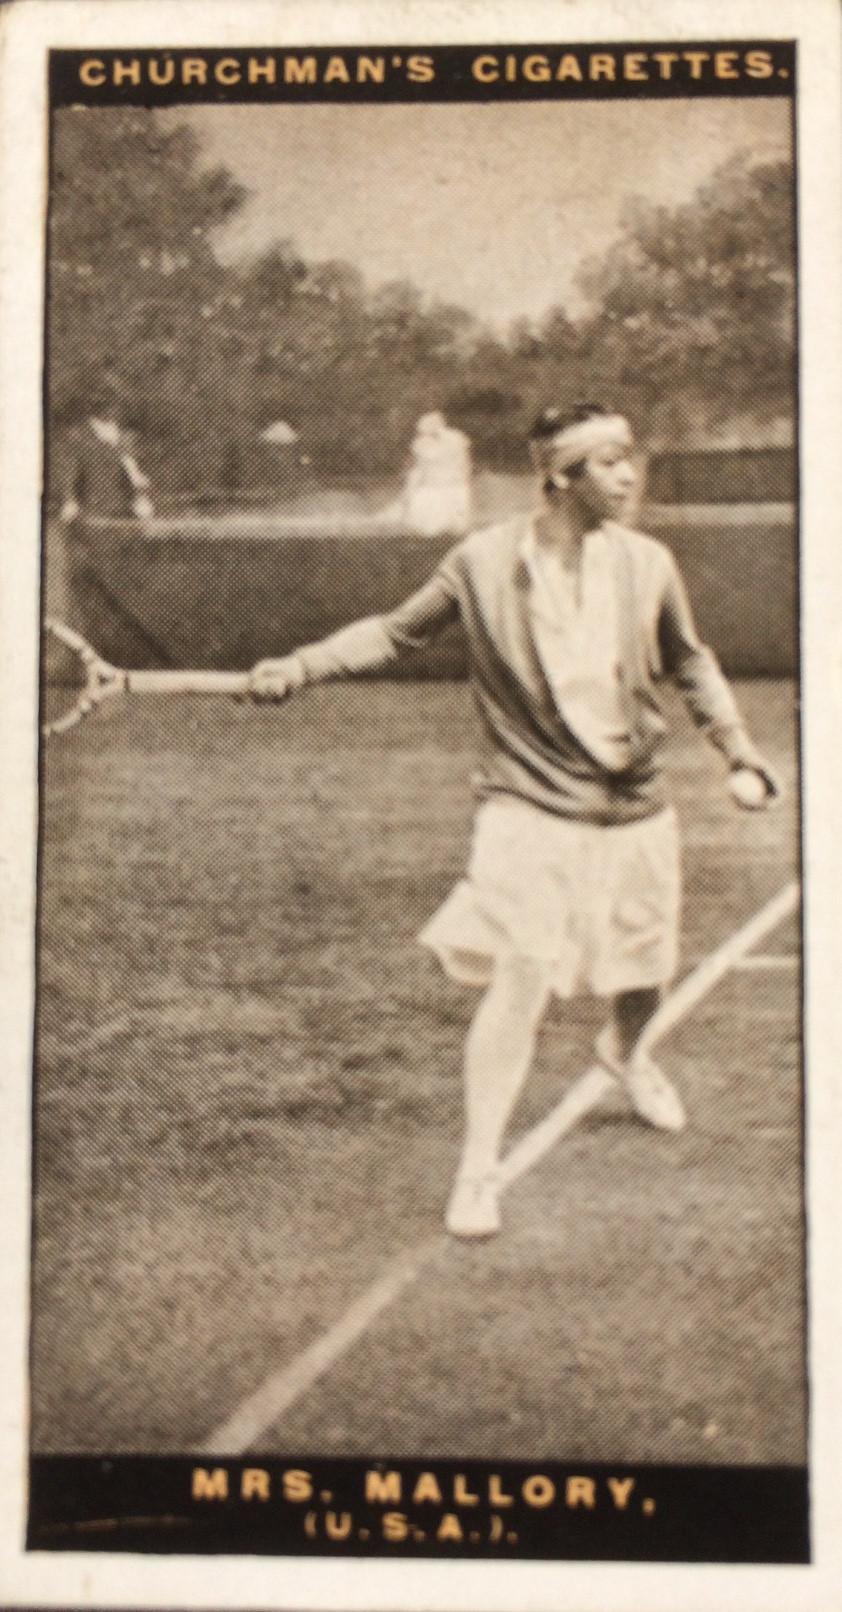 Card: Churchman's Cigarette trading card, 1928, card printed in the United Kingdom